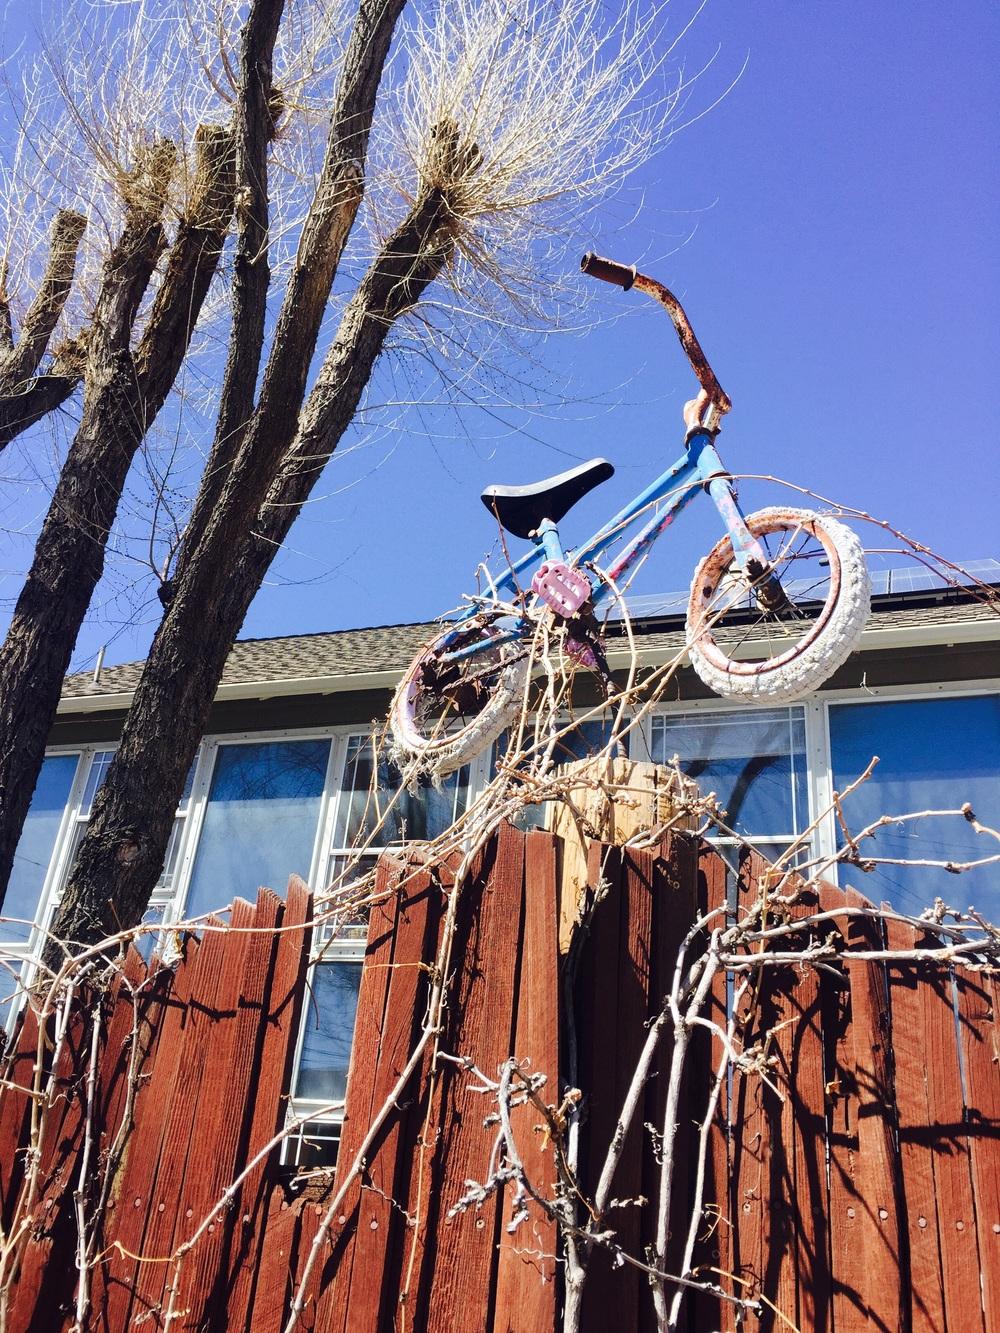 this was my beacon- princess bike